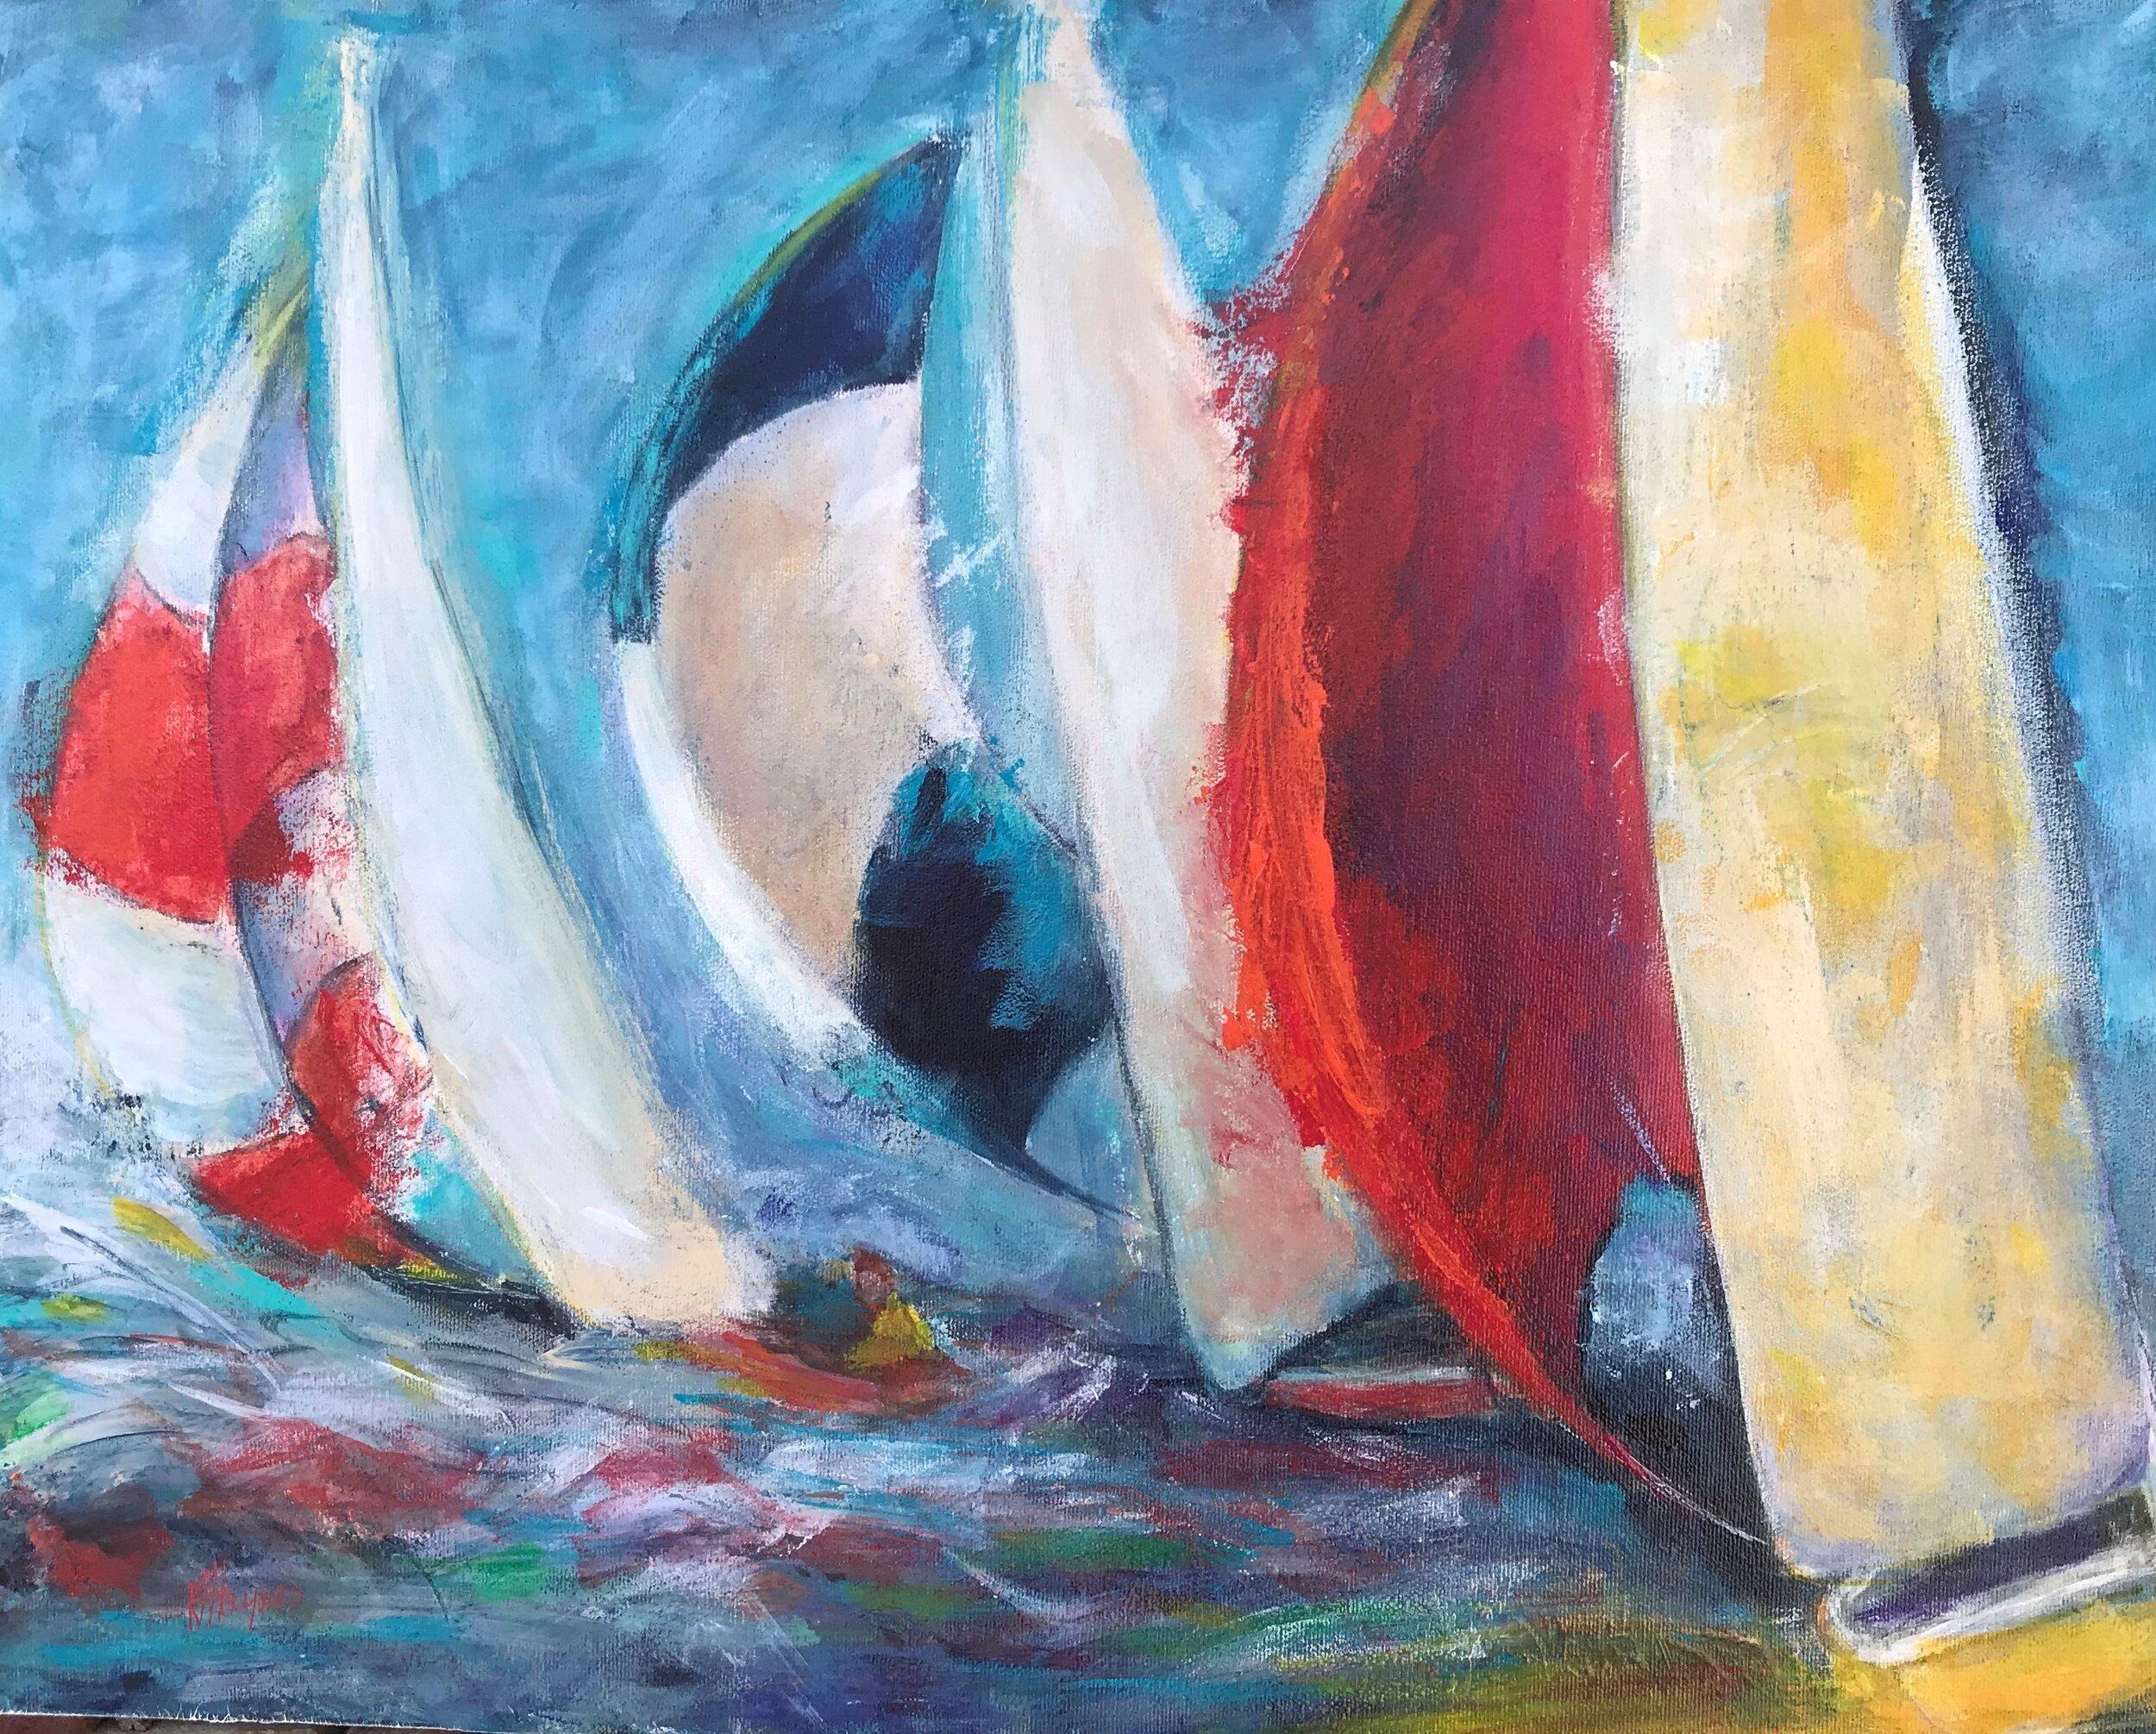 "Racing   16"" x 20"", acrylic on canvas"